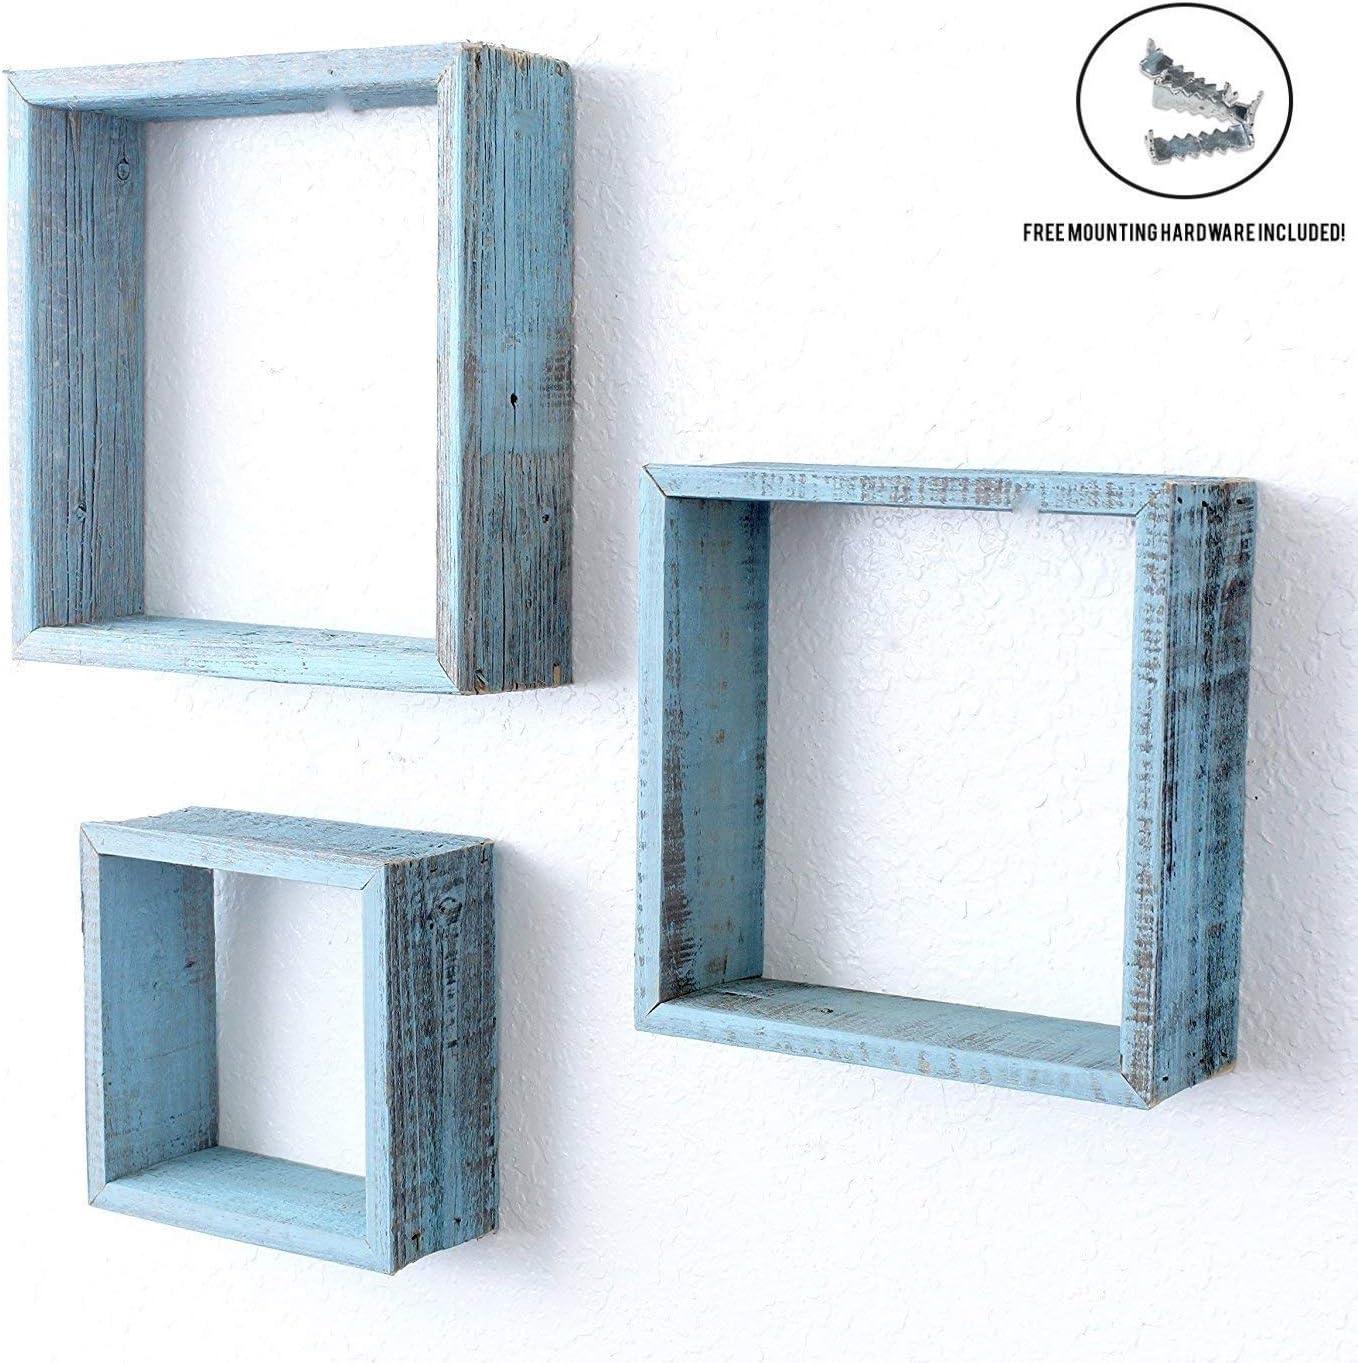 BarnwoodUSA Robin's Egg Blue Rustic Shelves, Square Floating Wood Shadowbox, Home Decor, Set of 3